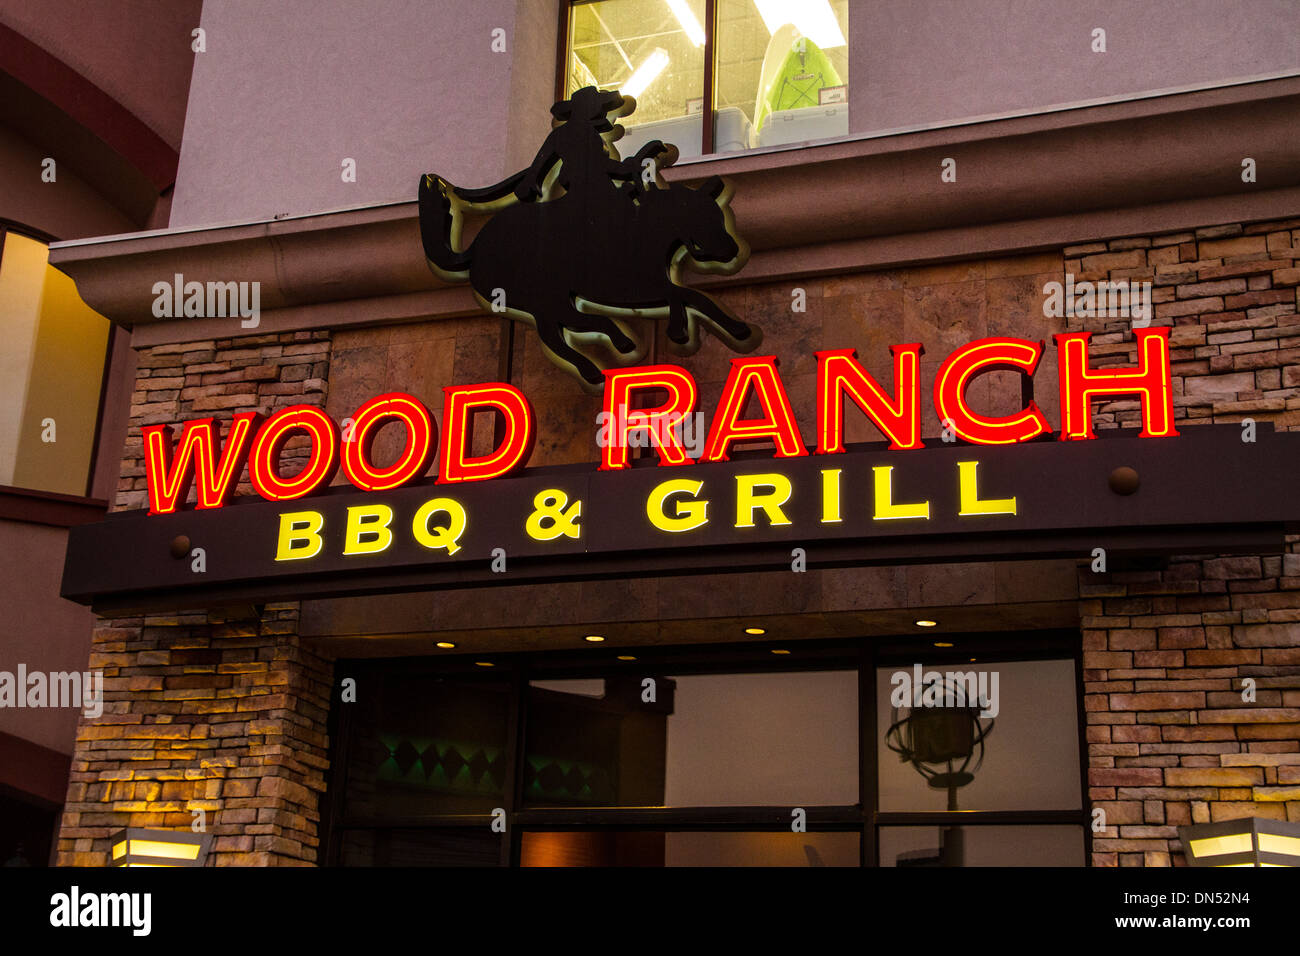 Wood Ranch Valencia WB Designs - Wood Ranch Dos Lagos WB Designs